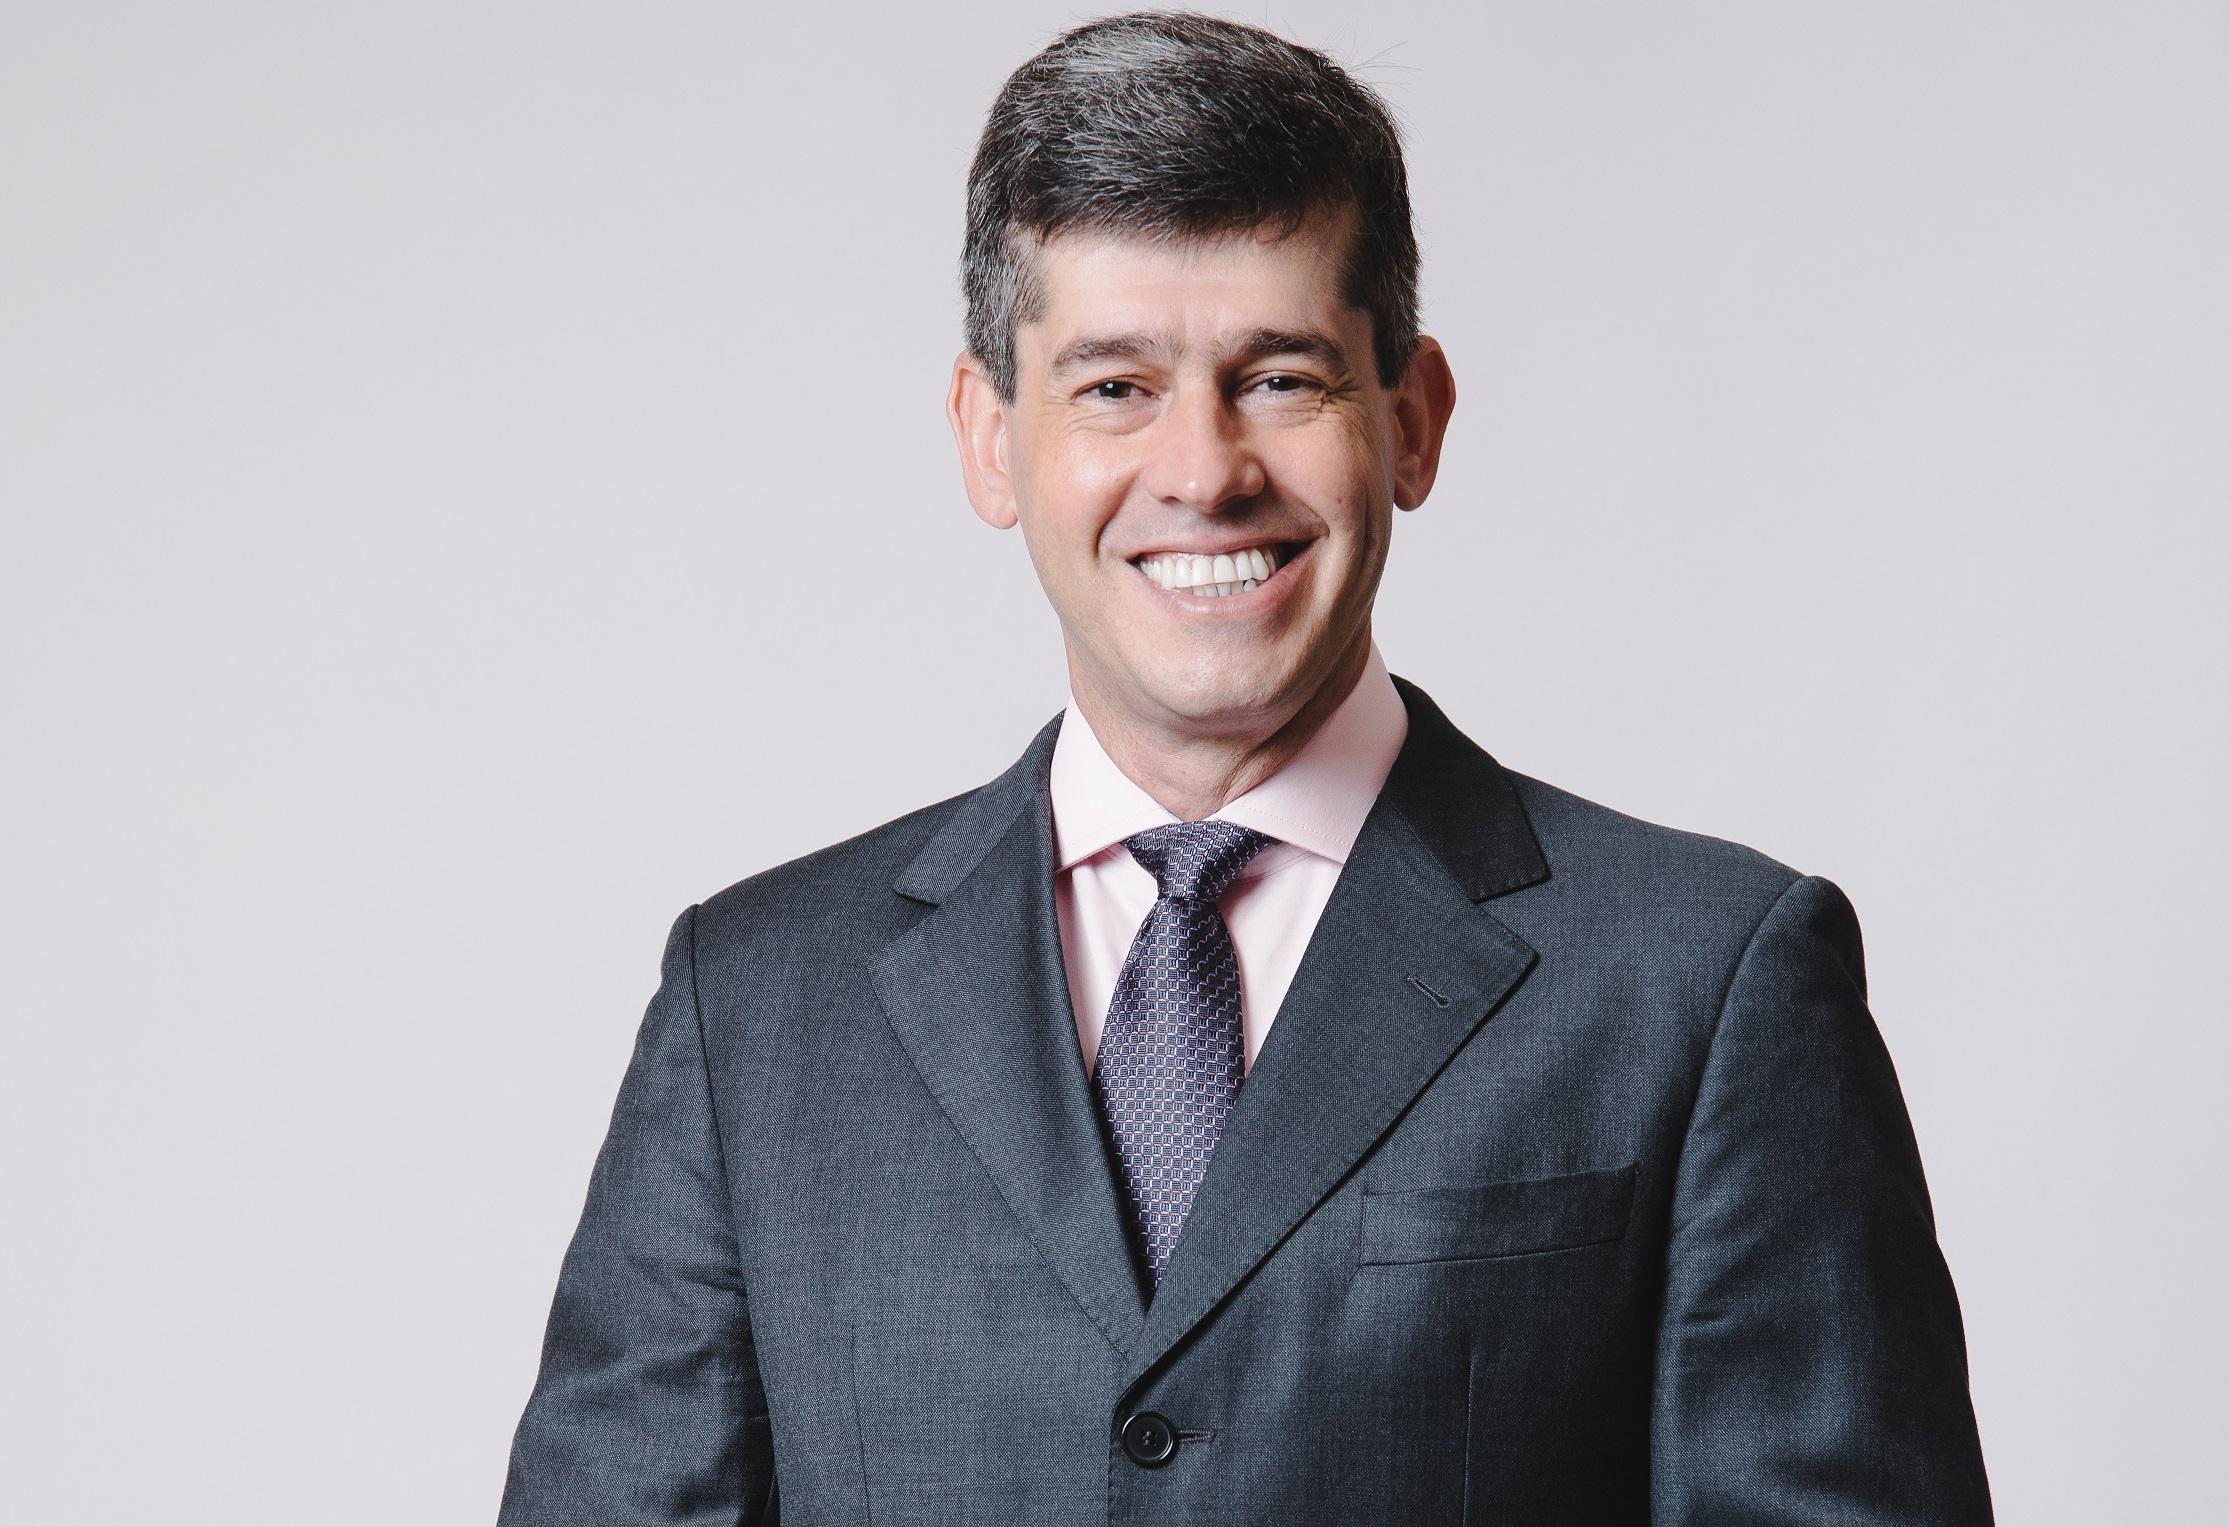 FM Logistic l-a numit pe Ronaldo Fernandes da Silva in functia de Managing Director al FM Brazilia